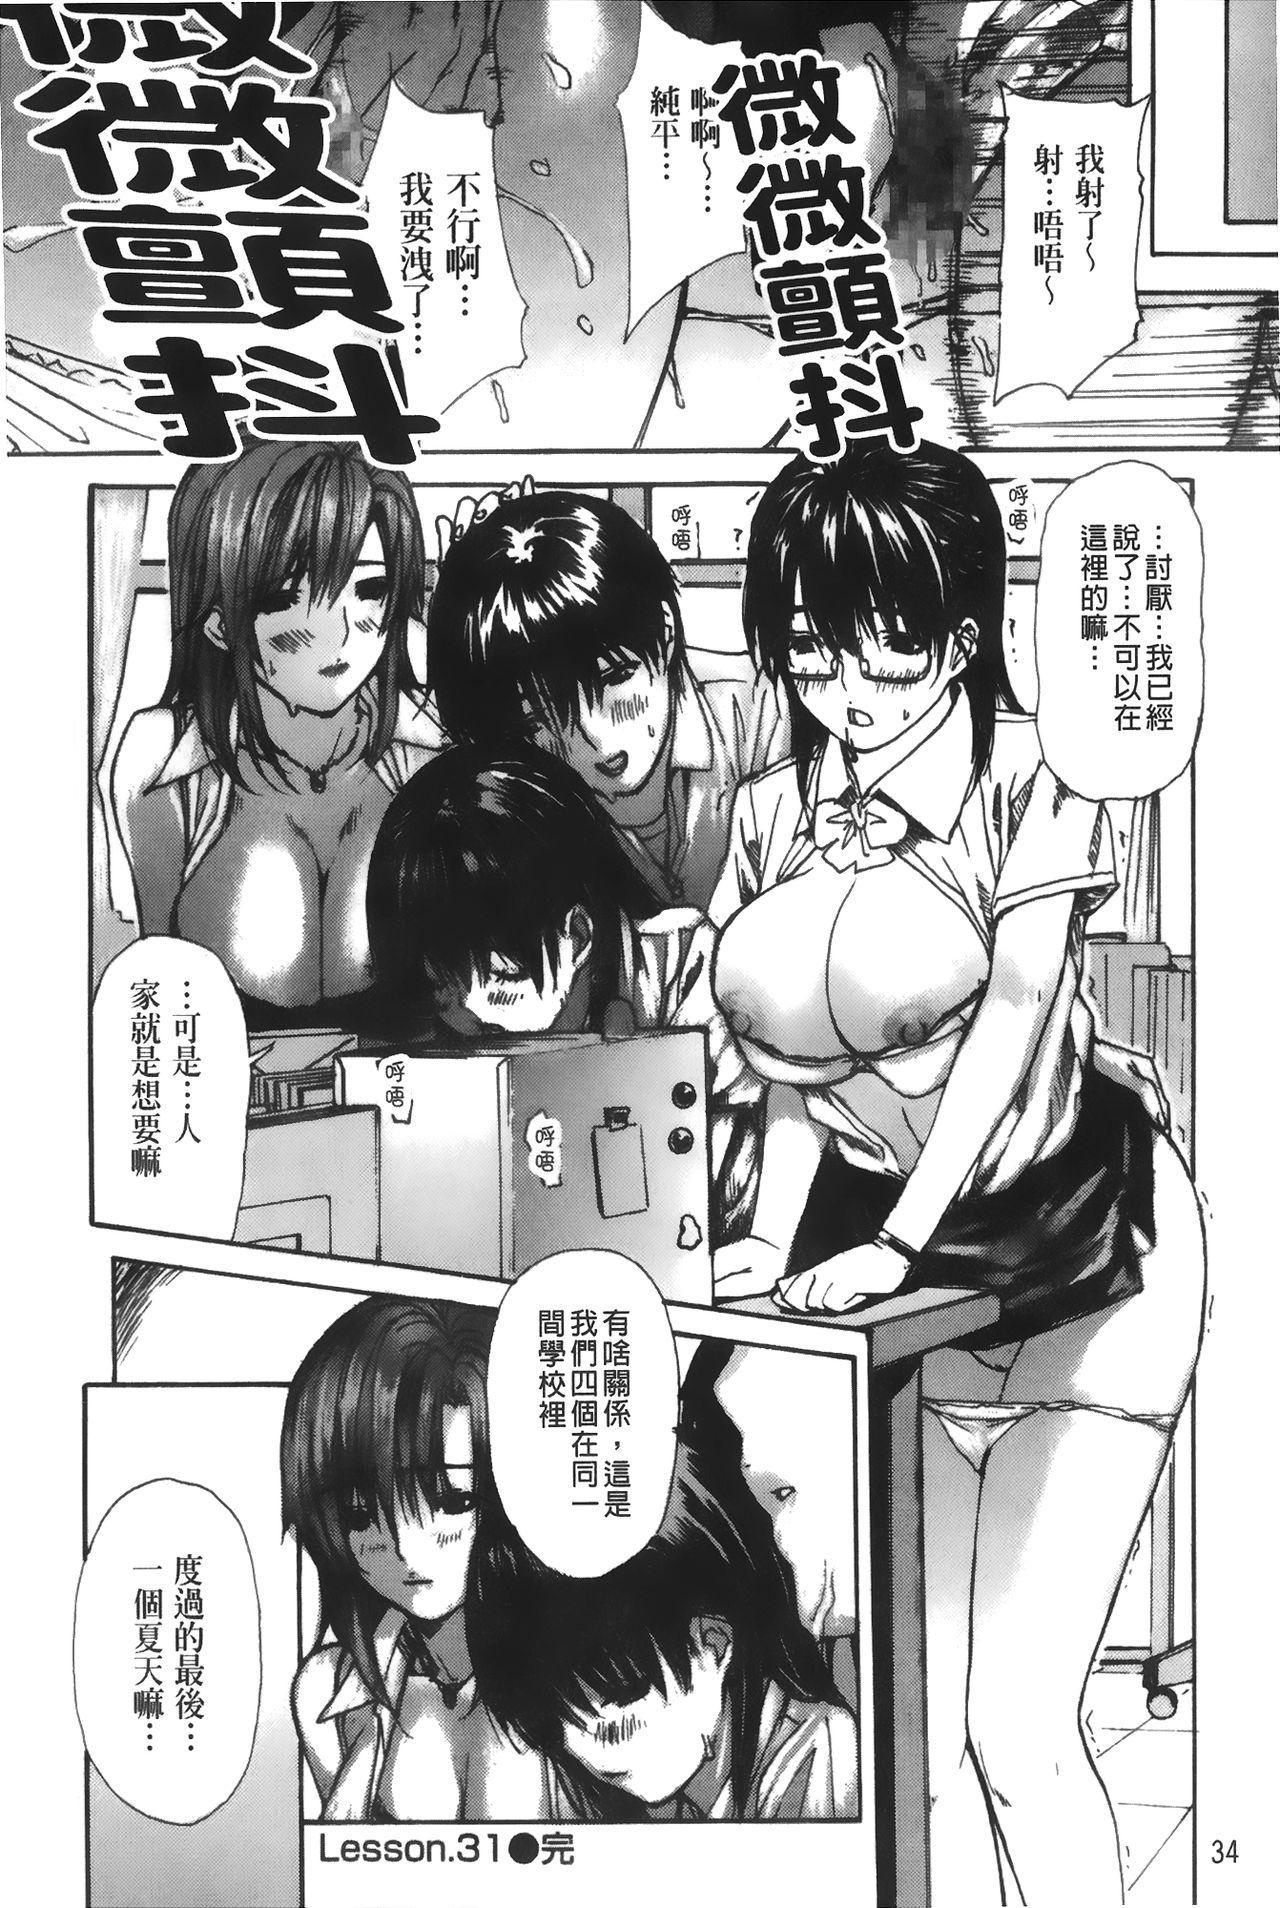 Tonari no Minano Sensei 4 | 隔壁的美奈乃老師 4 35